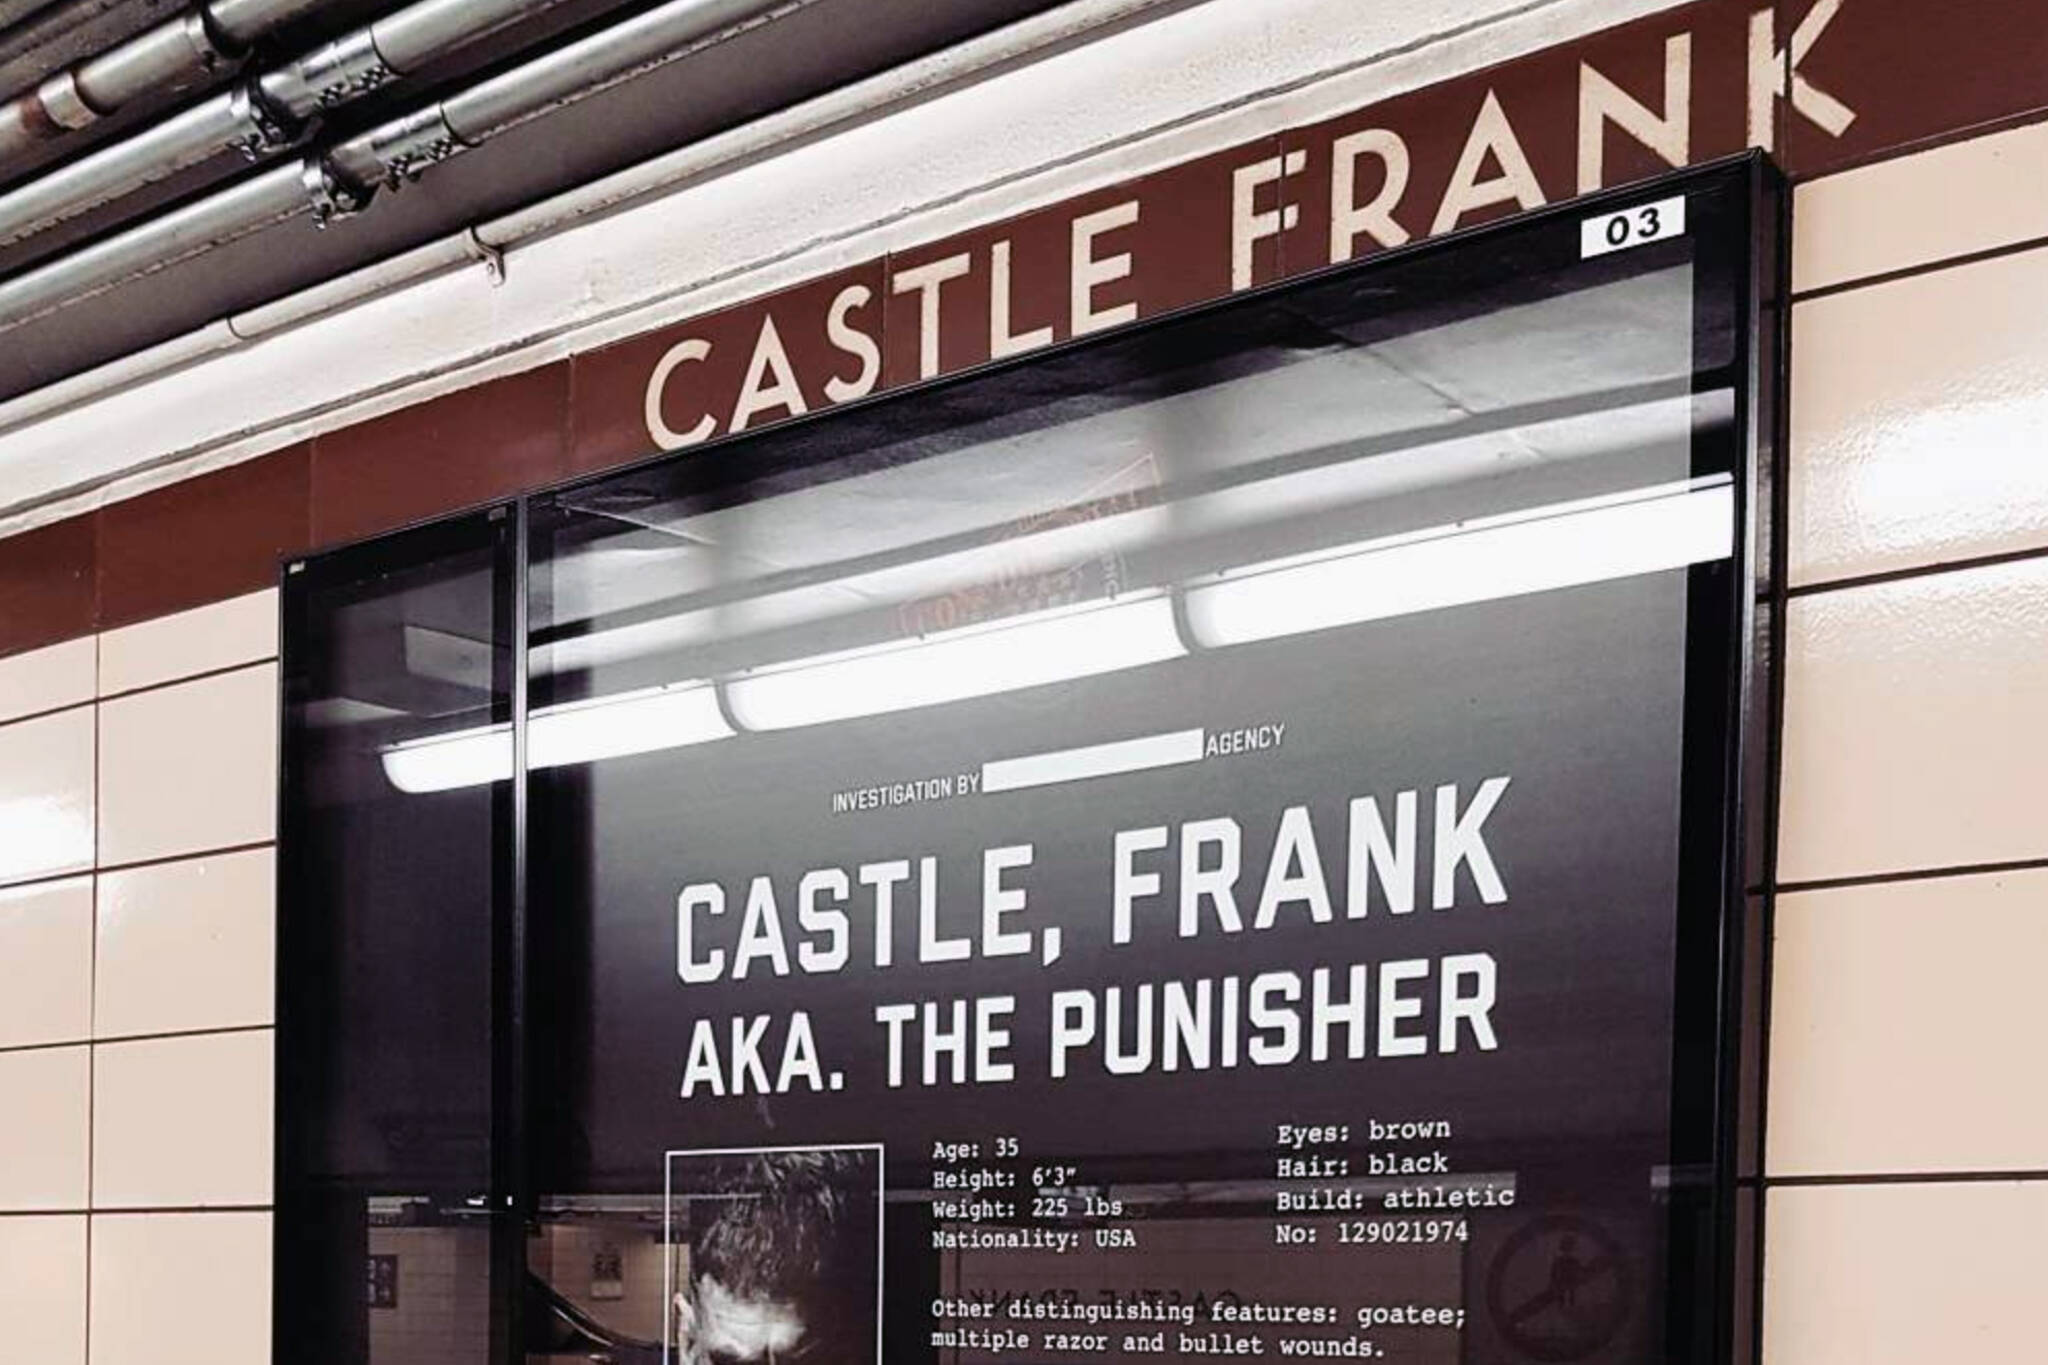 castle frank toronto